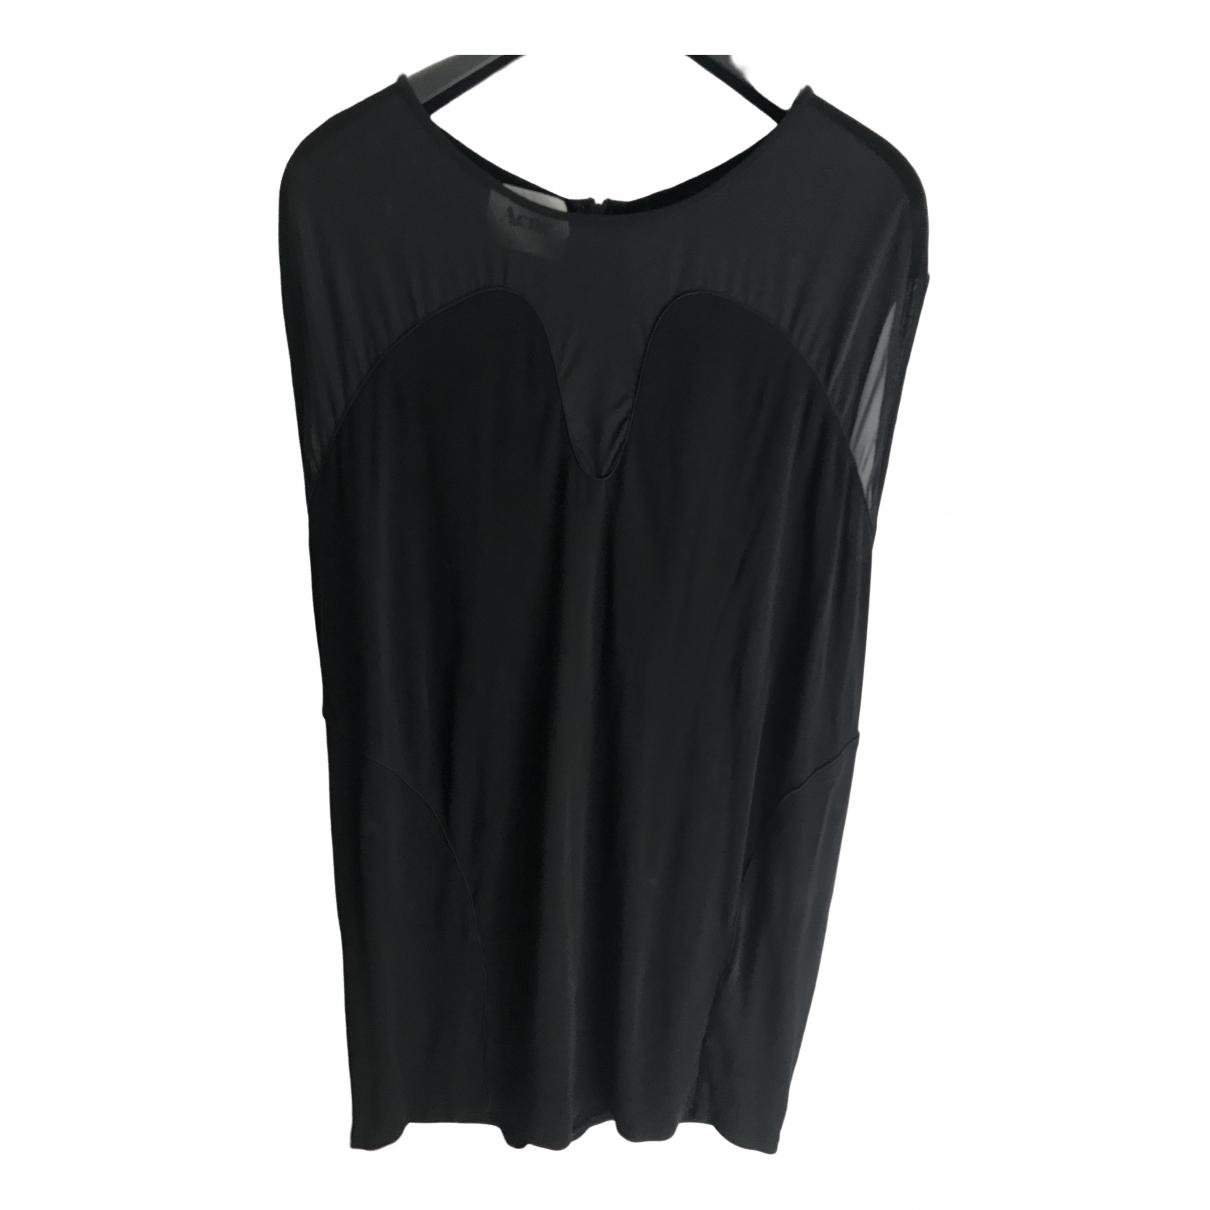 Acne Studios \N Black dress for Women L International